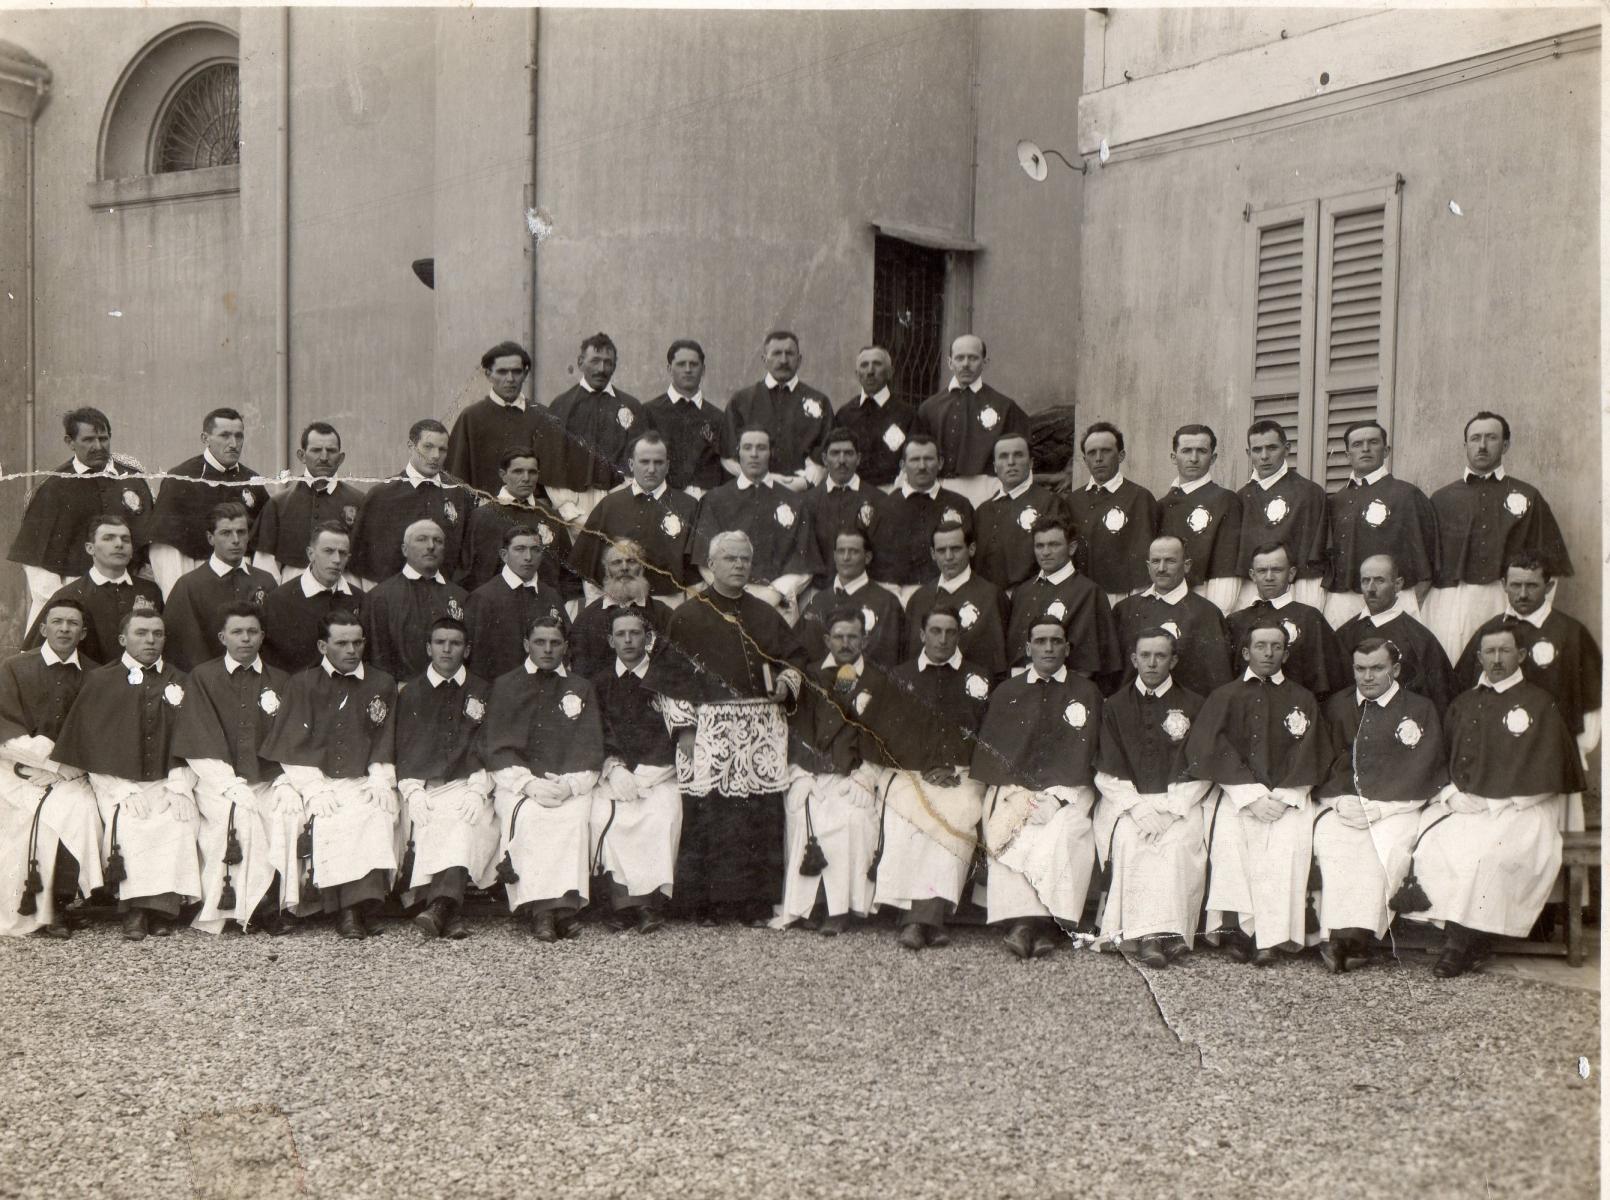 confratelli 1930